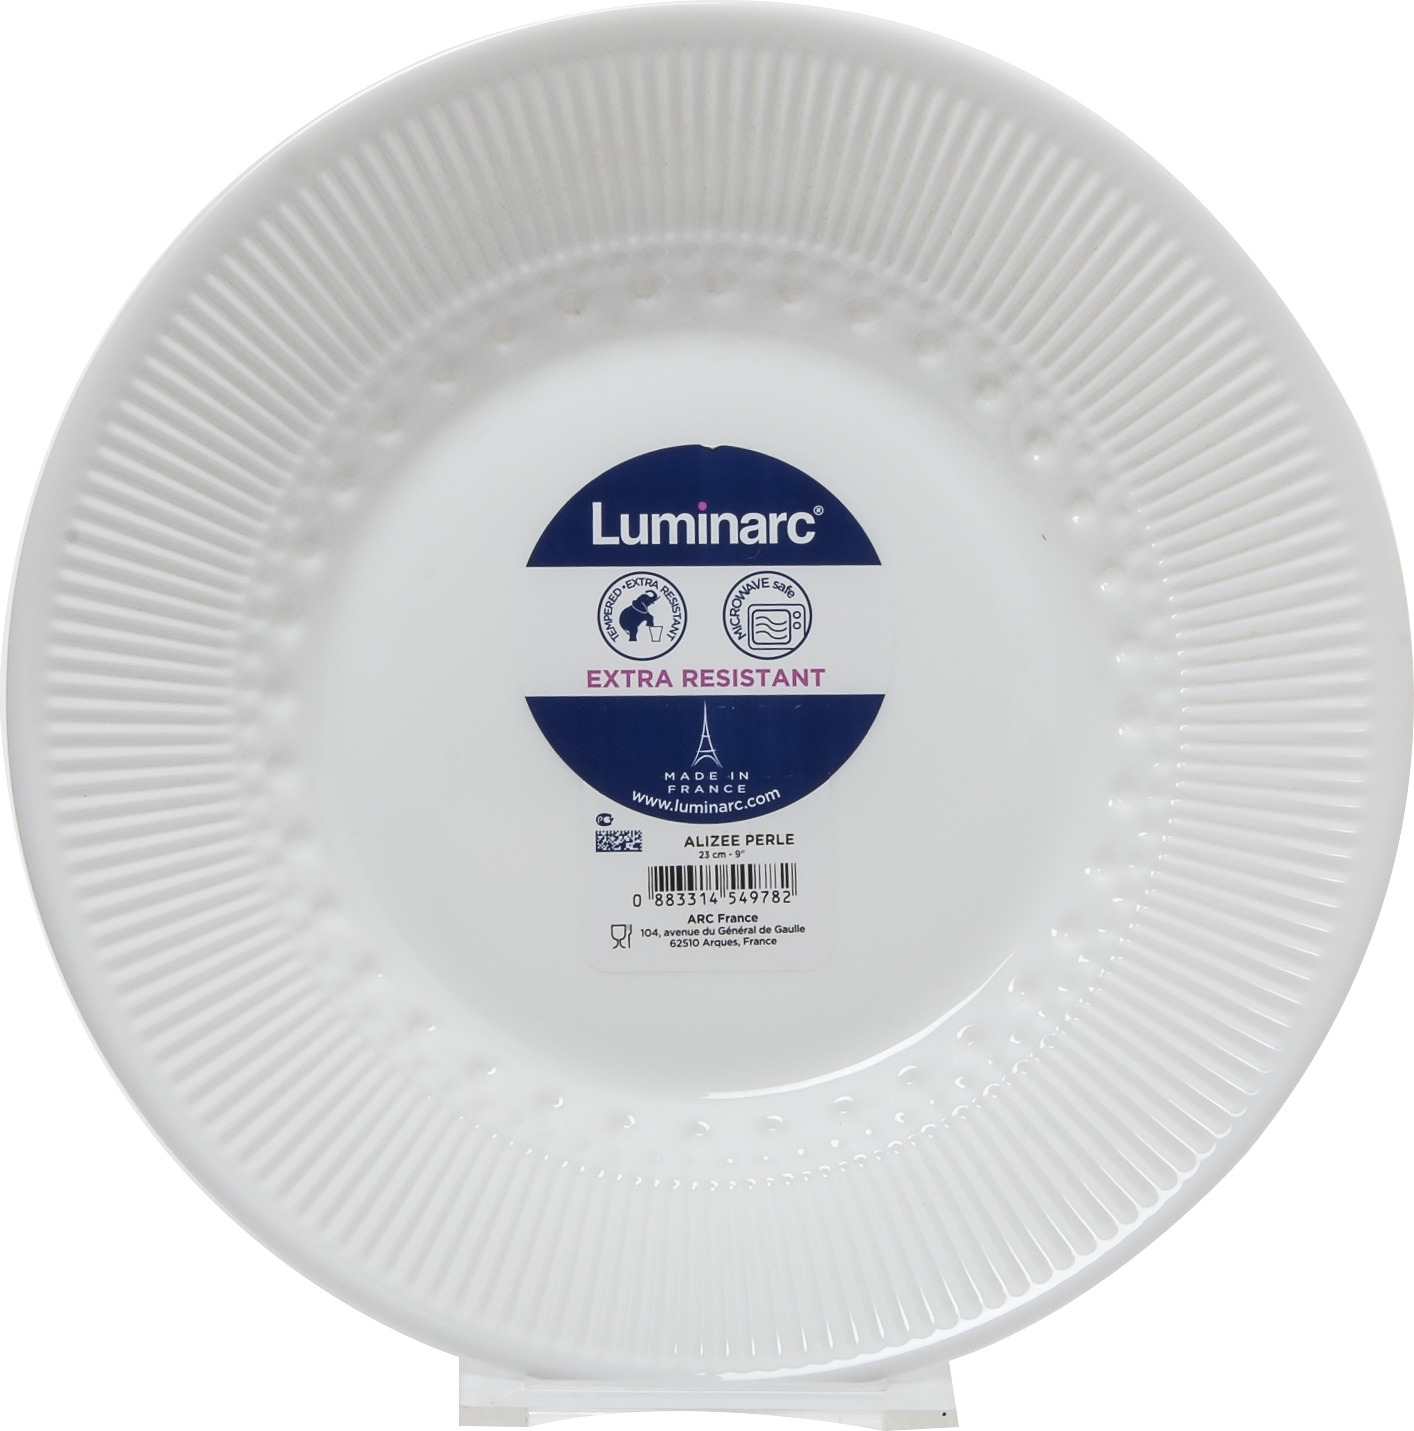 Тарелка глубокая Luminarc Ализе Перл, L6347, белый, диаметр 23 см тарелка глубокая luminarc ализэ перл n4836 белый диаметр 23 см